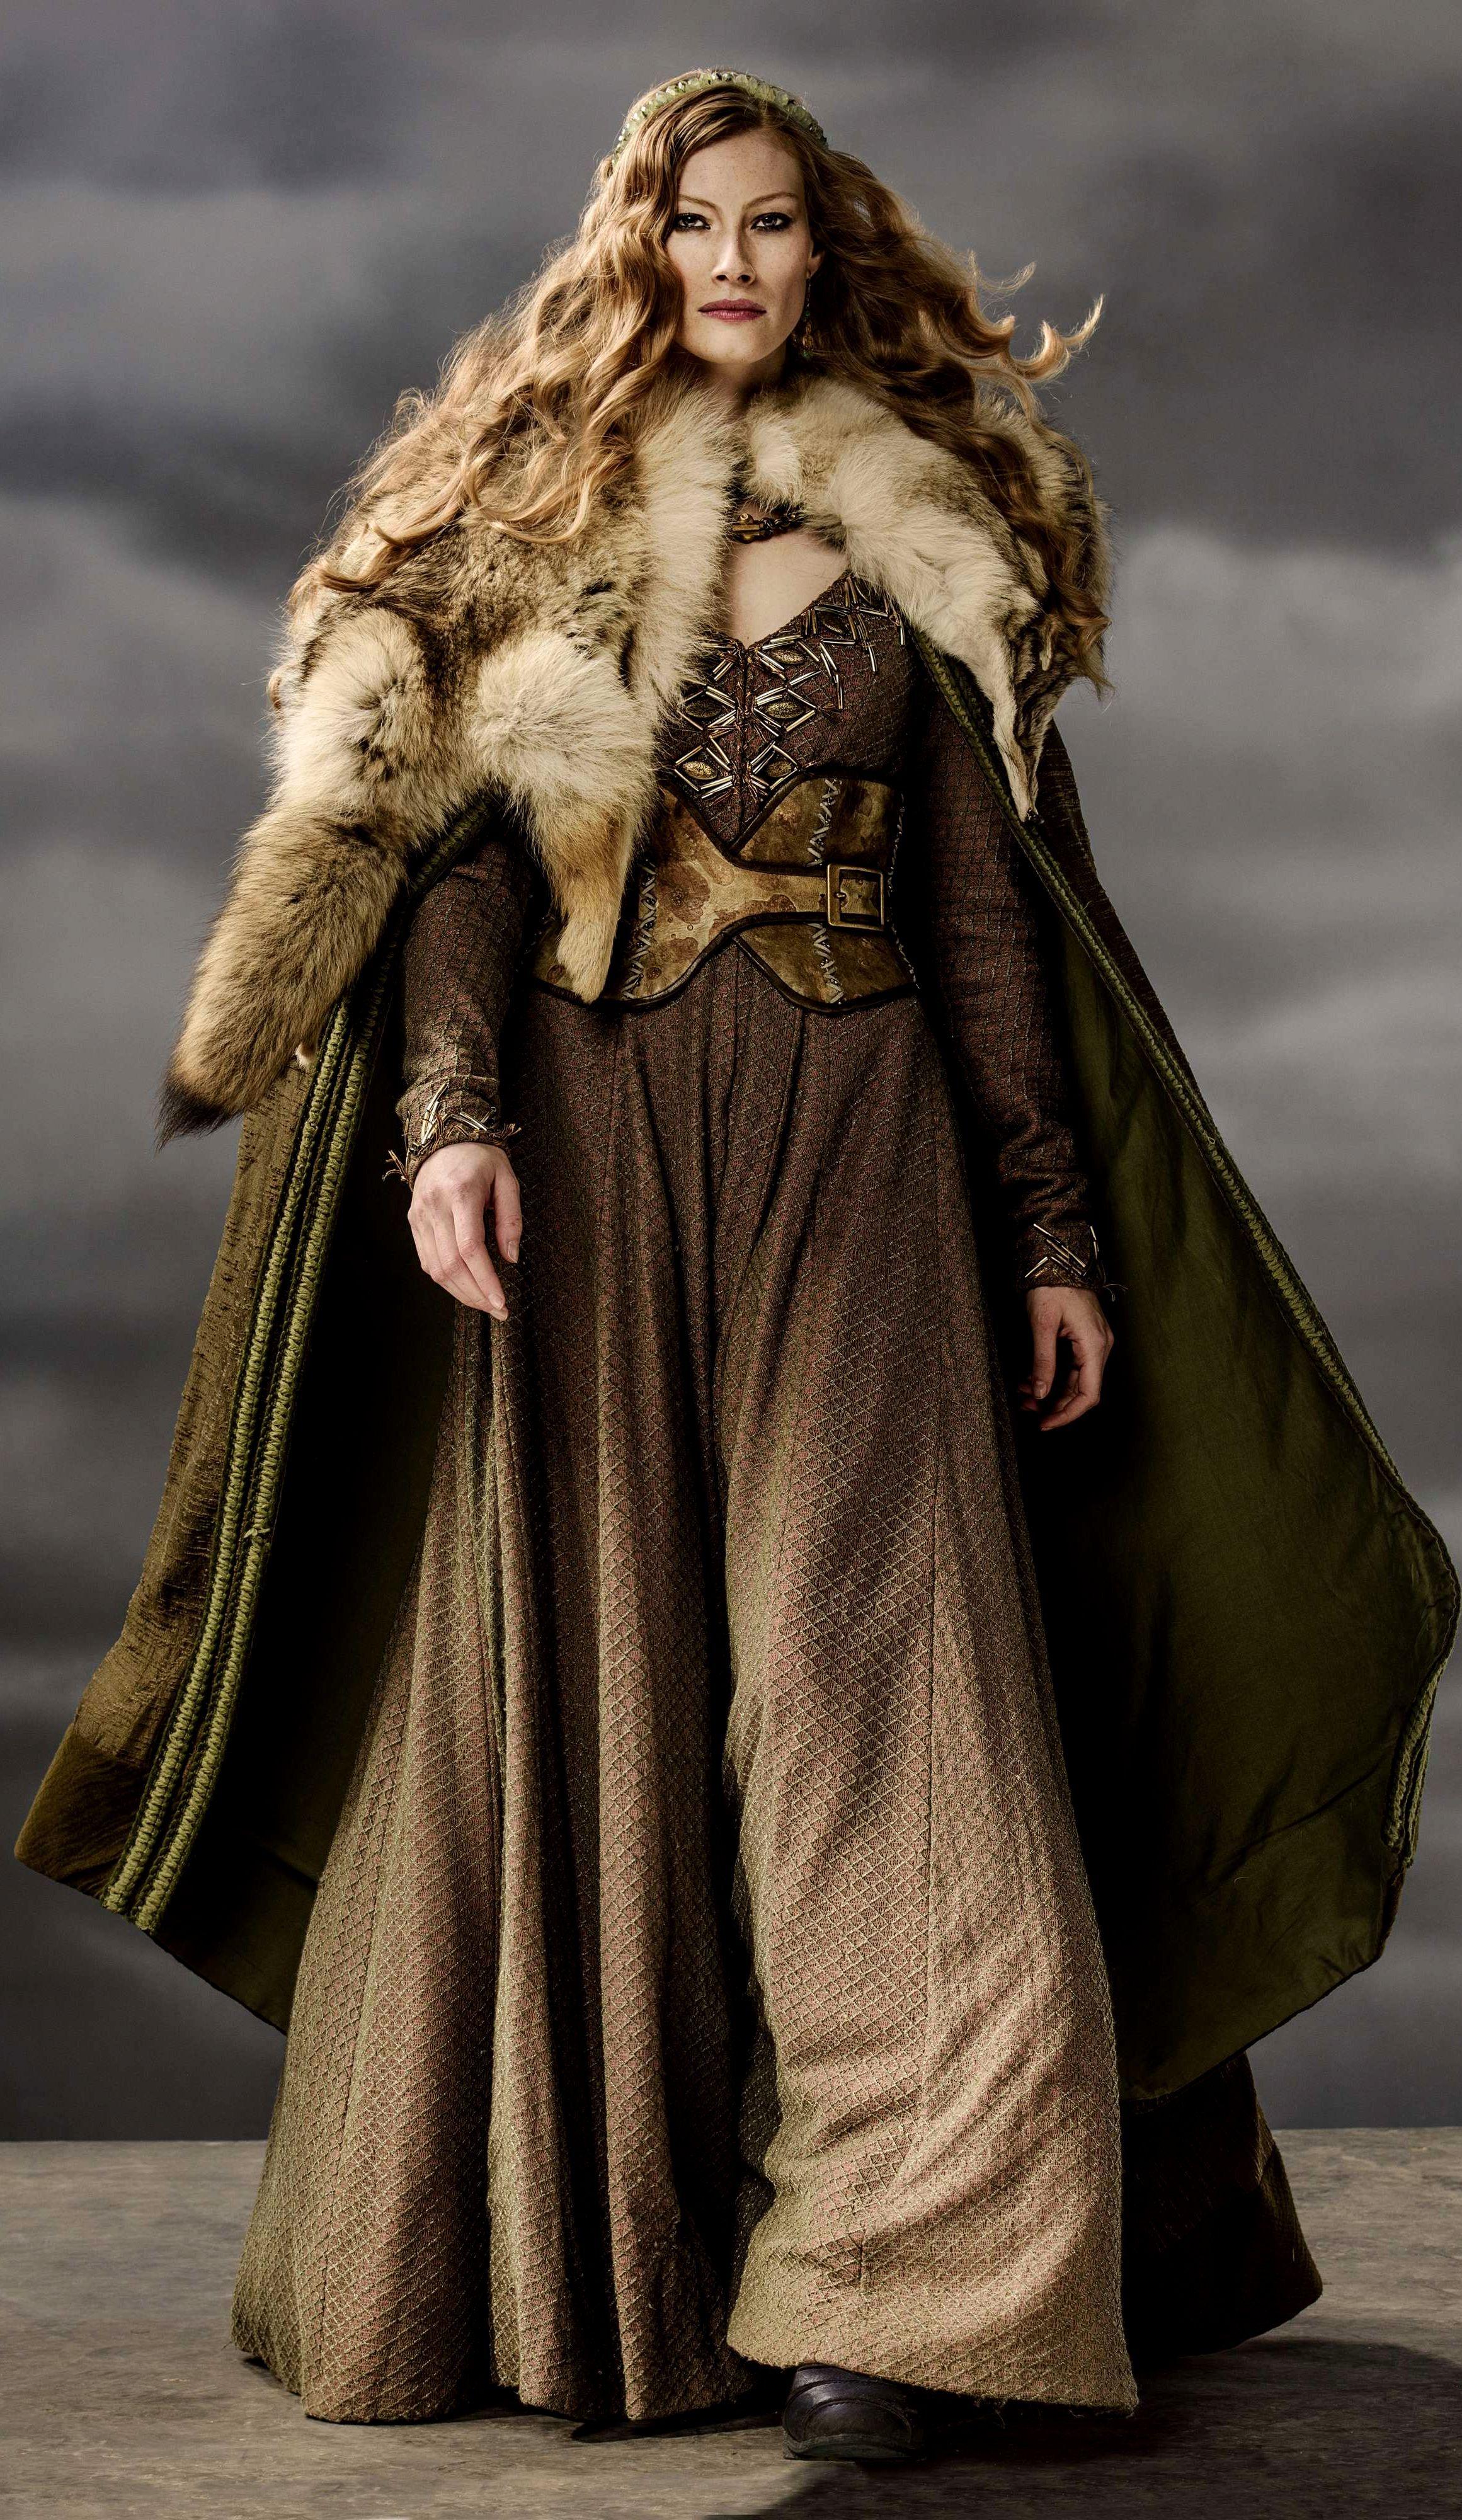 FANTASY WONDERFUL FASHION Viking dress, Viking clothing